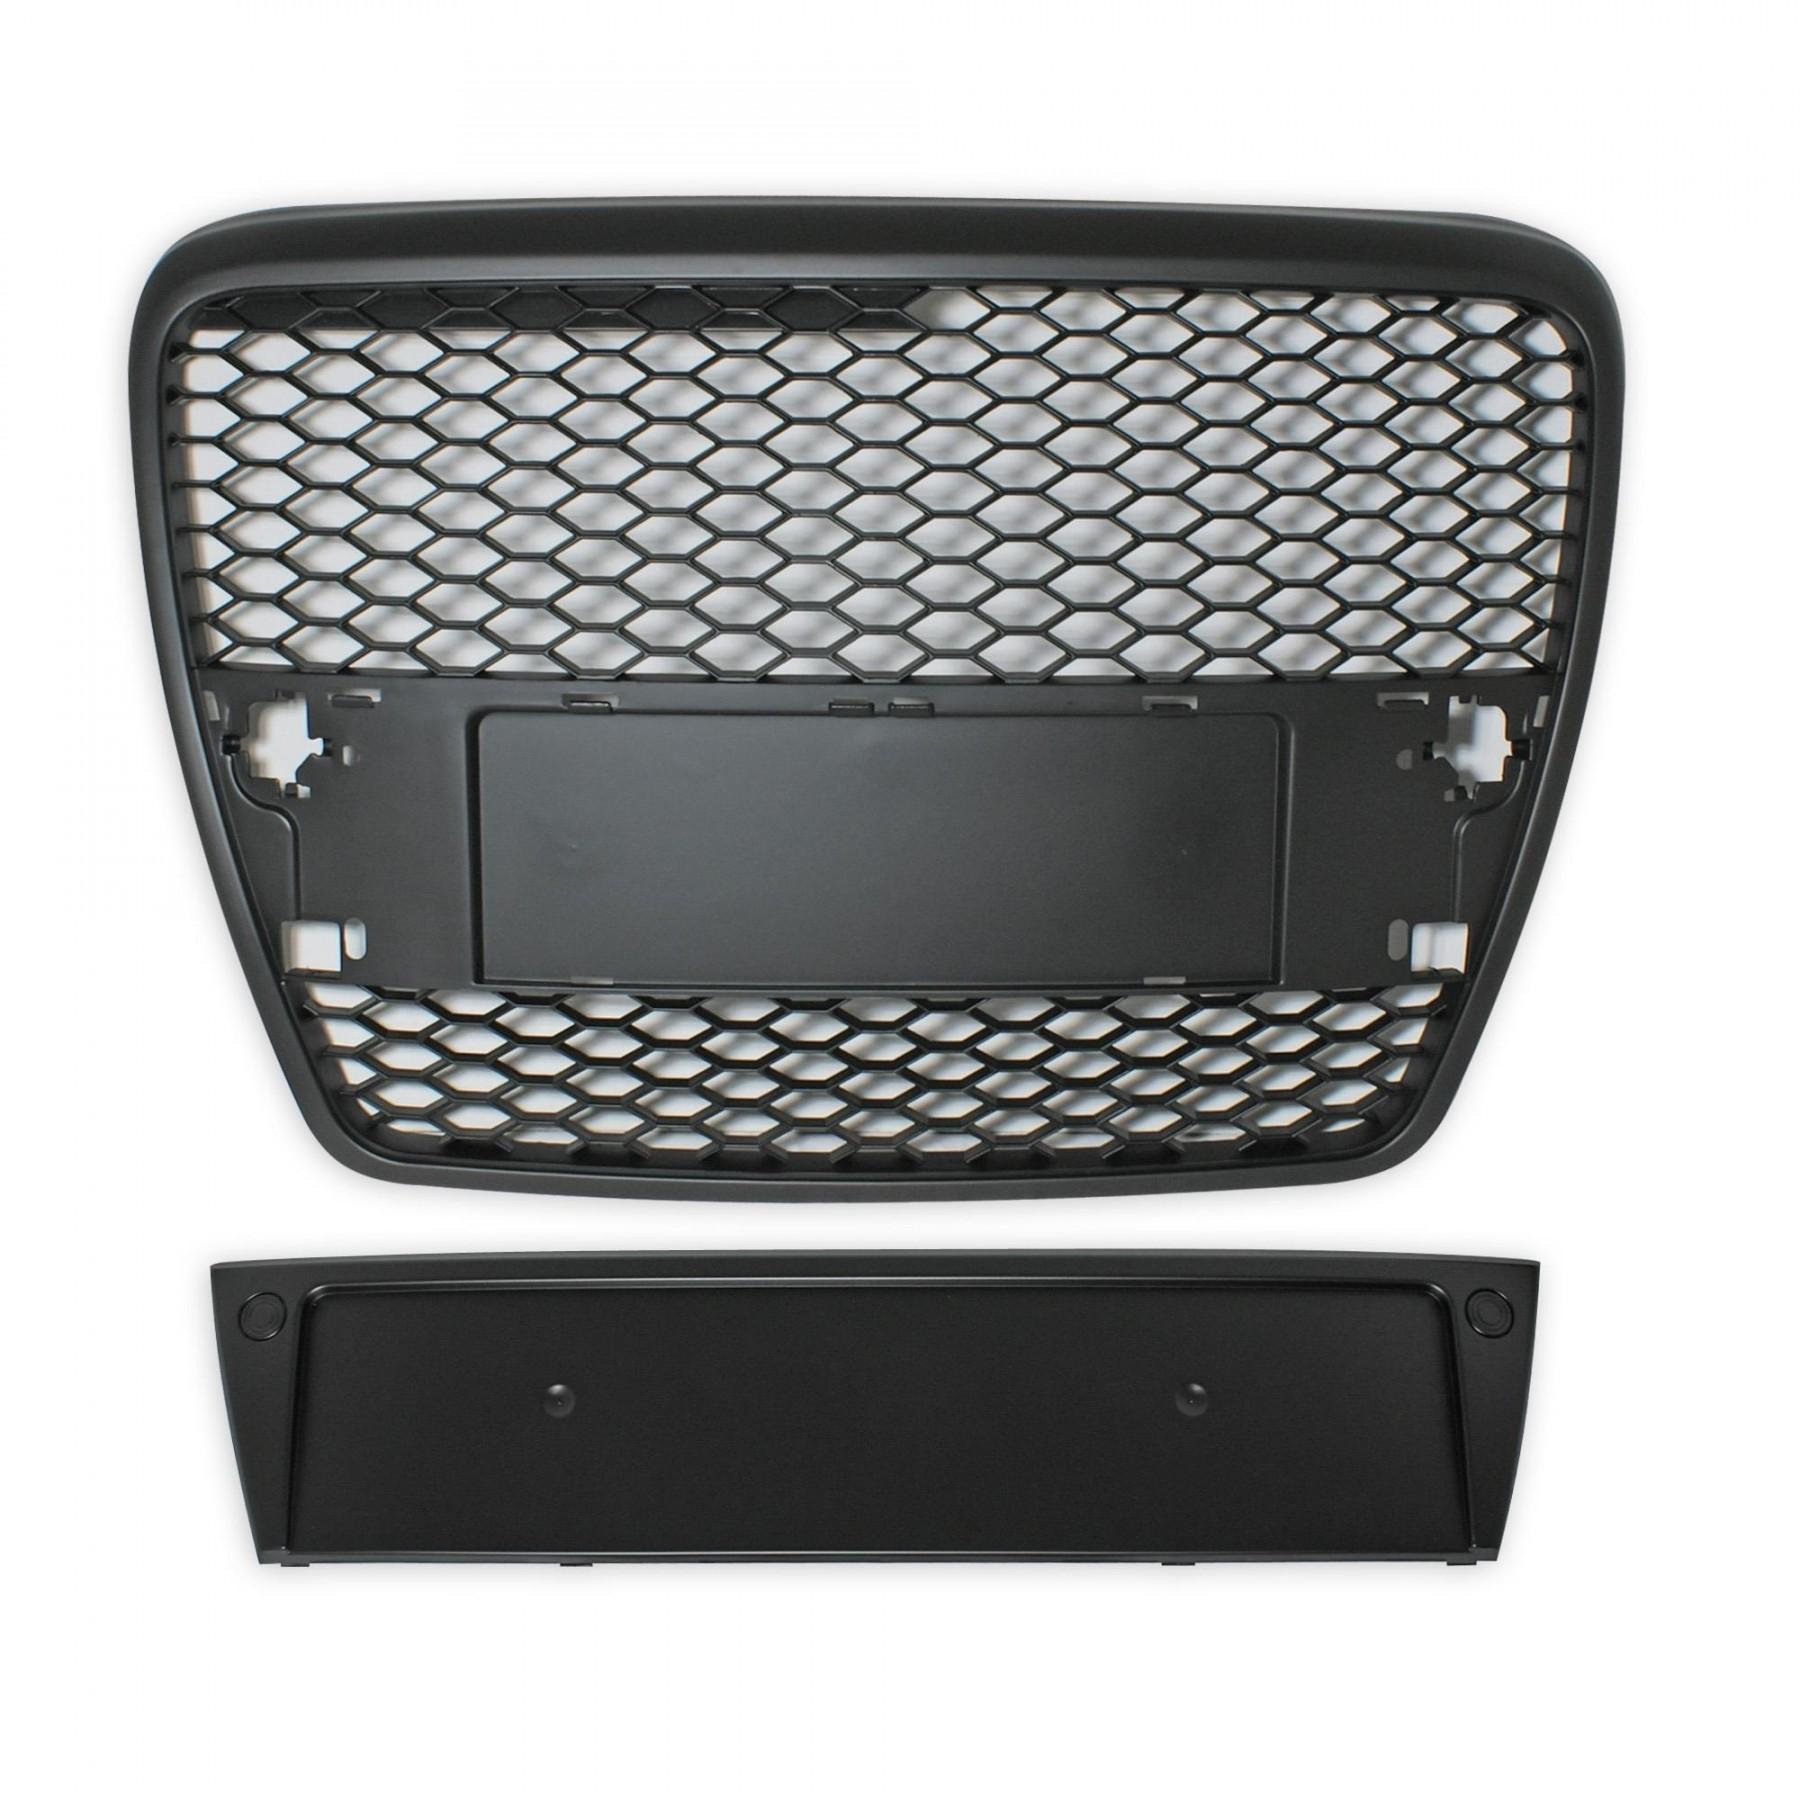 grill audi a6 4f 05 07 zwart jom 4f0853653moe. Black Bedroom Furniture Sets. Home Design Ideas